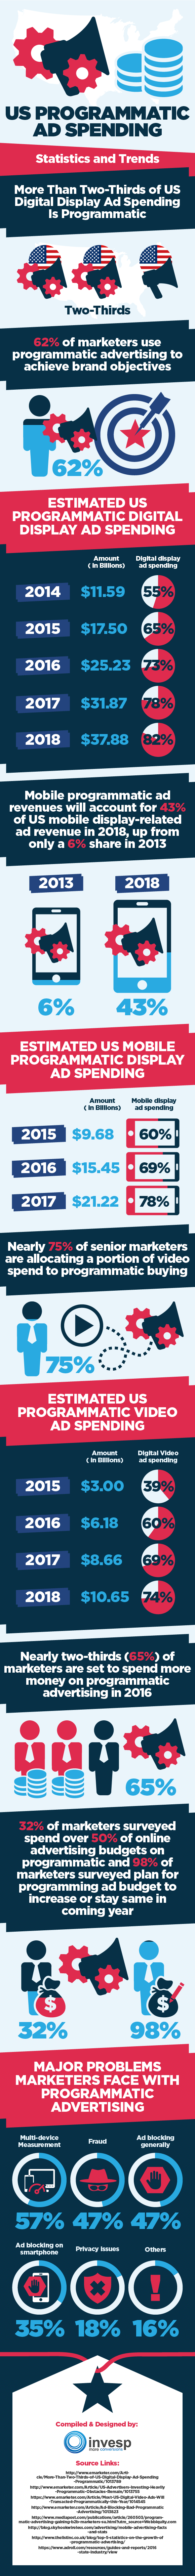 US programmatic ad spending